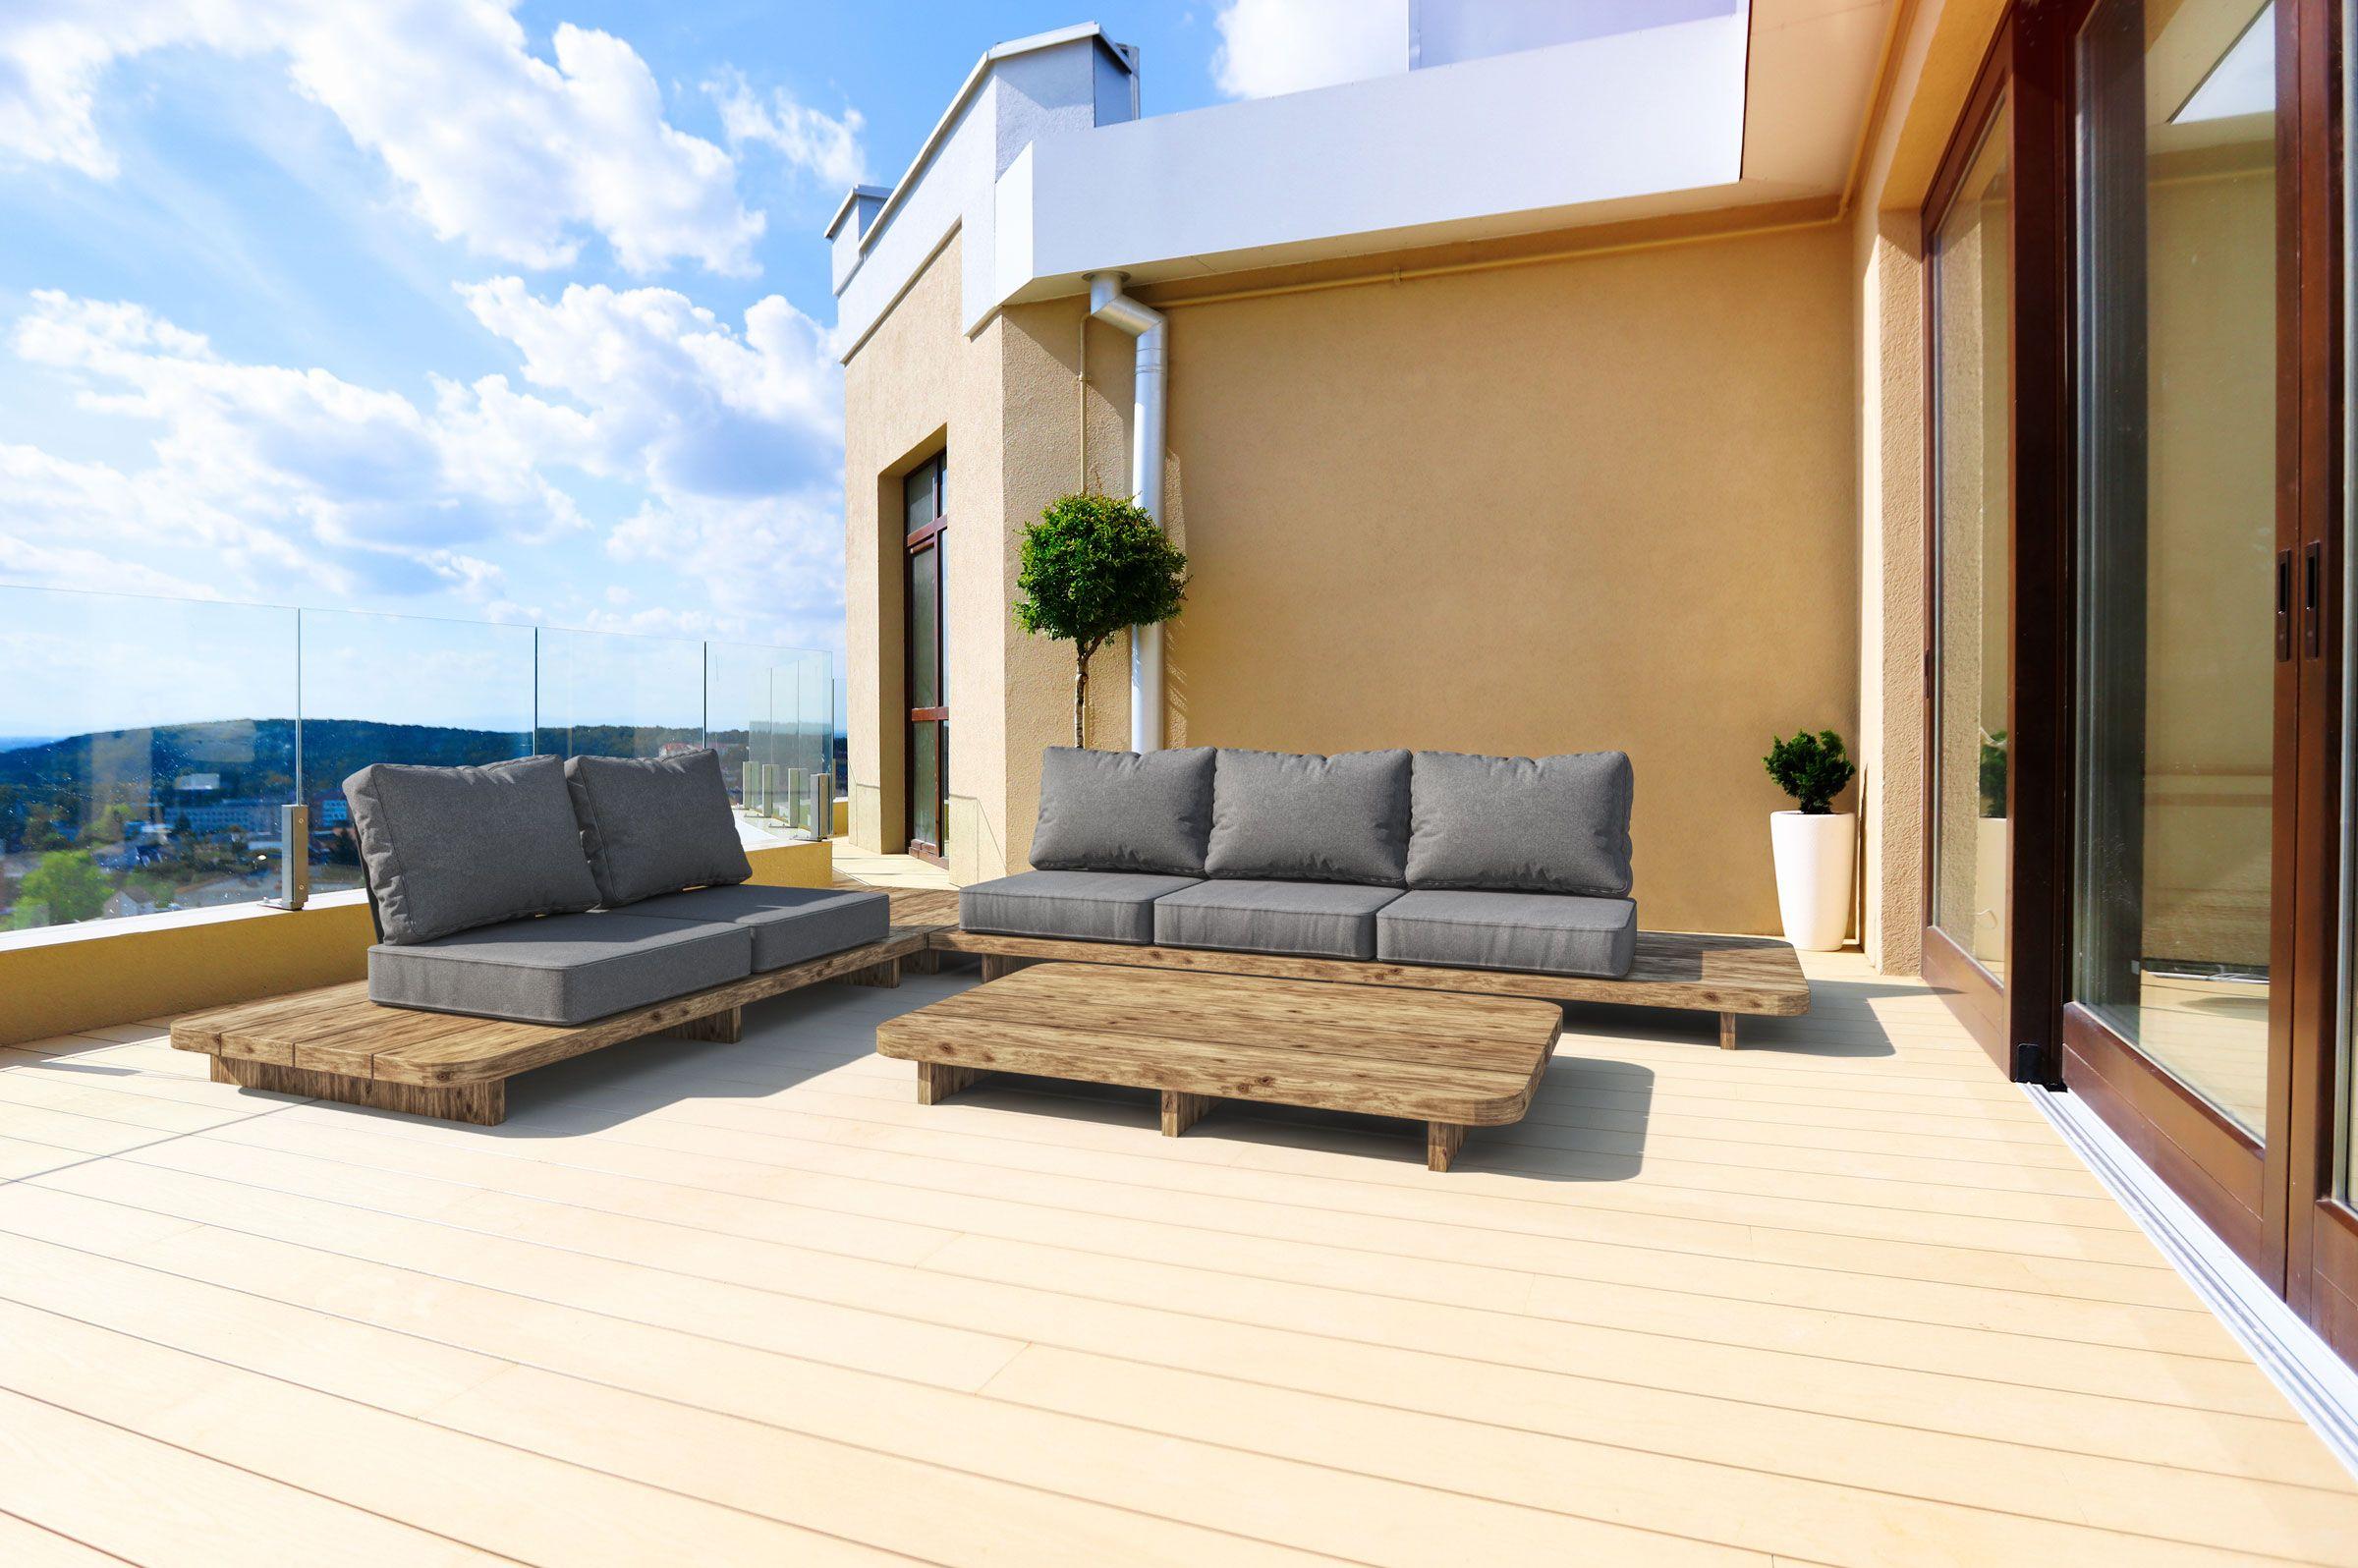 Outflexx Loungemobel Natur Recycled Teak 5 Sitzplatze Inkl Kissen 20304 In 2021 Lounge Mobel Teak Lounge